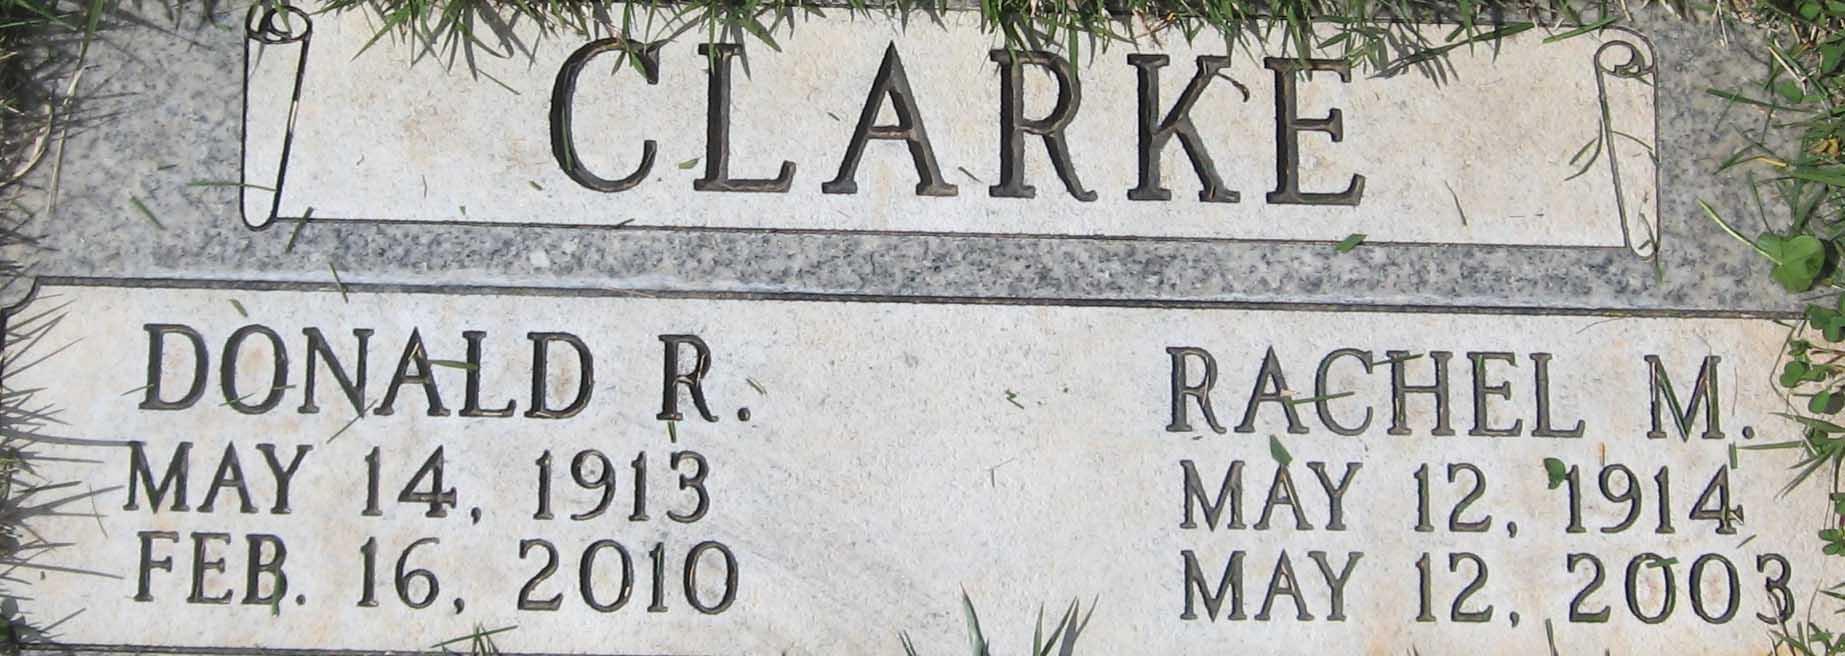 Donald R Clarke